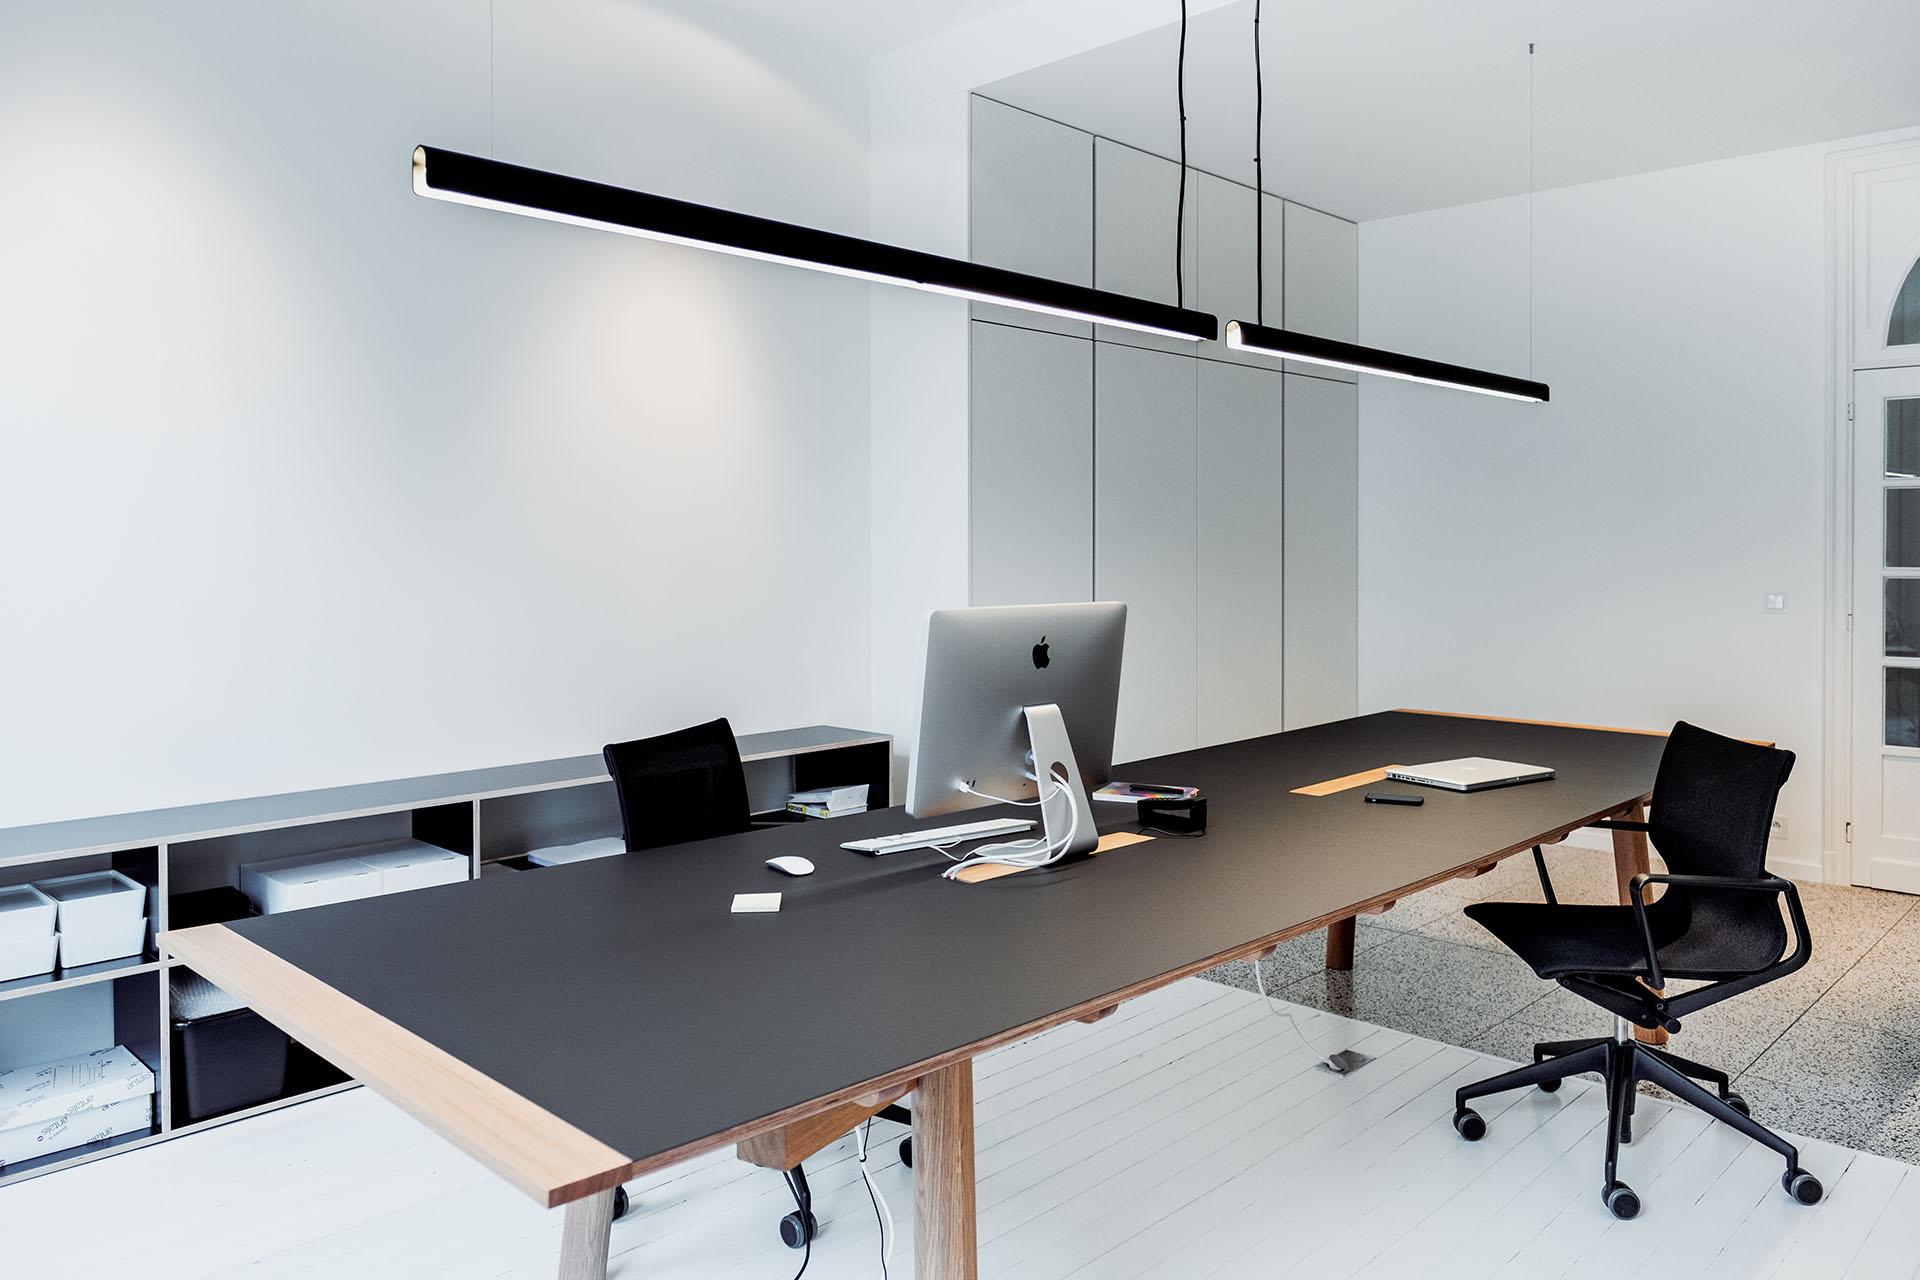 Awesome Office Studio Alain Monnens 09 Studio Alain Monnens Pabps2019 Chair Design Images Pabps2019Com